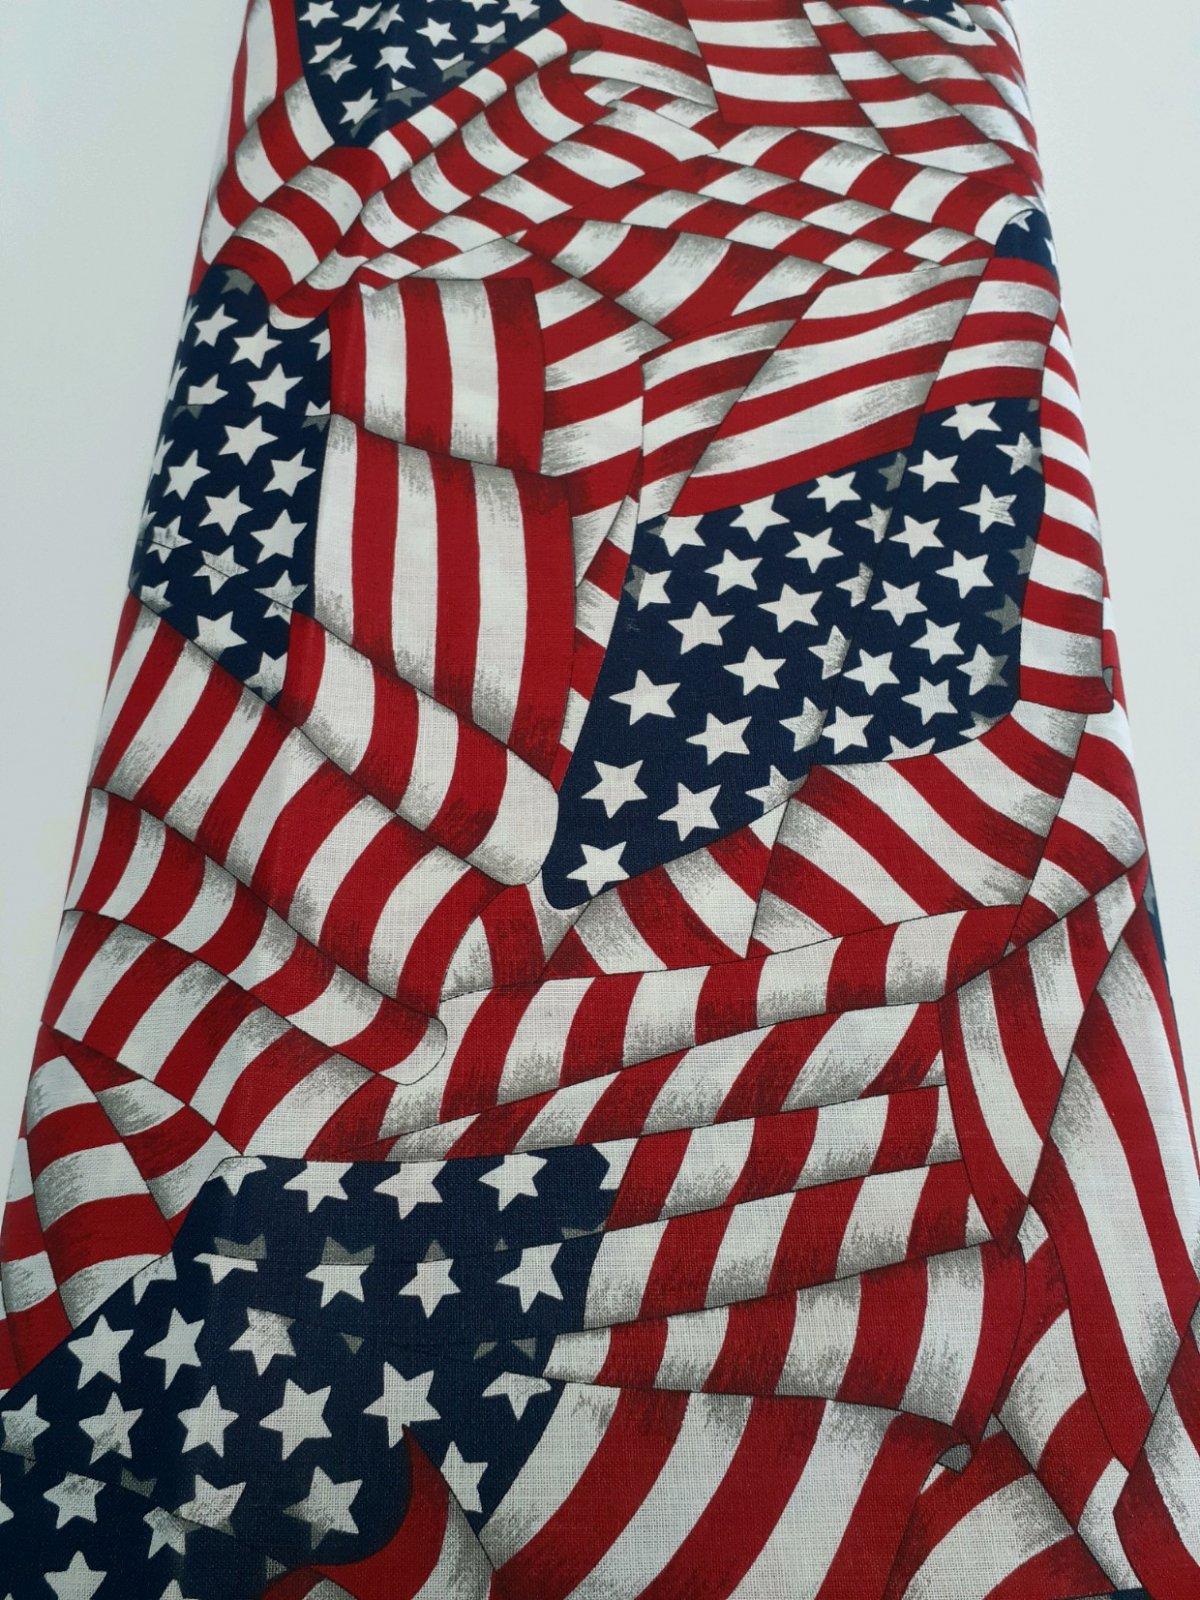 Stars & Stripes - Allover Flag 100% Cotton